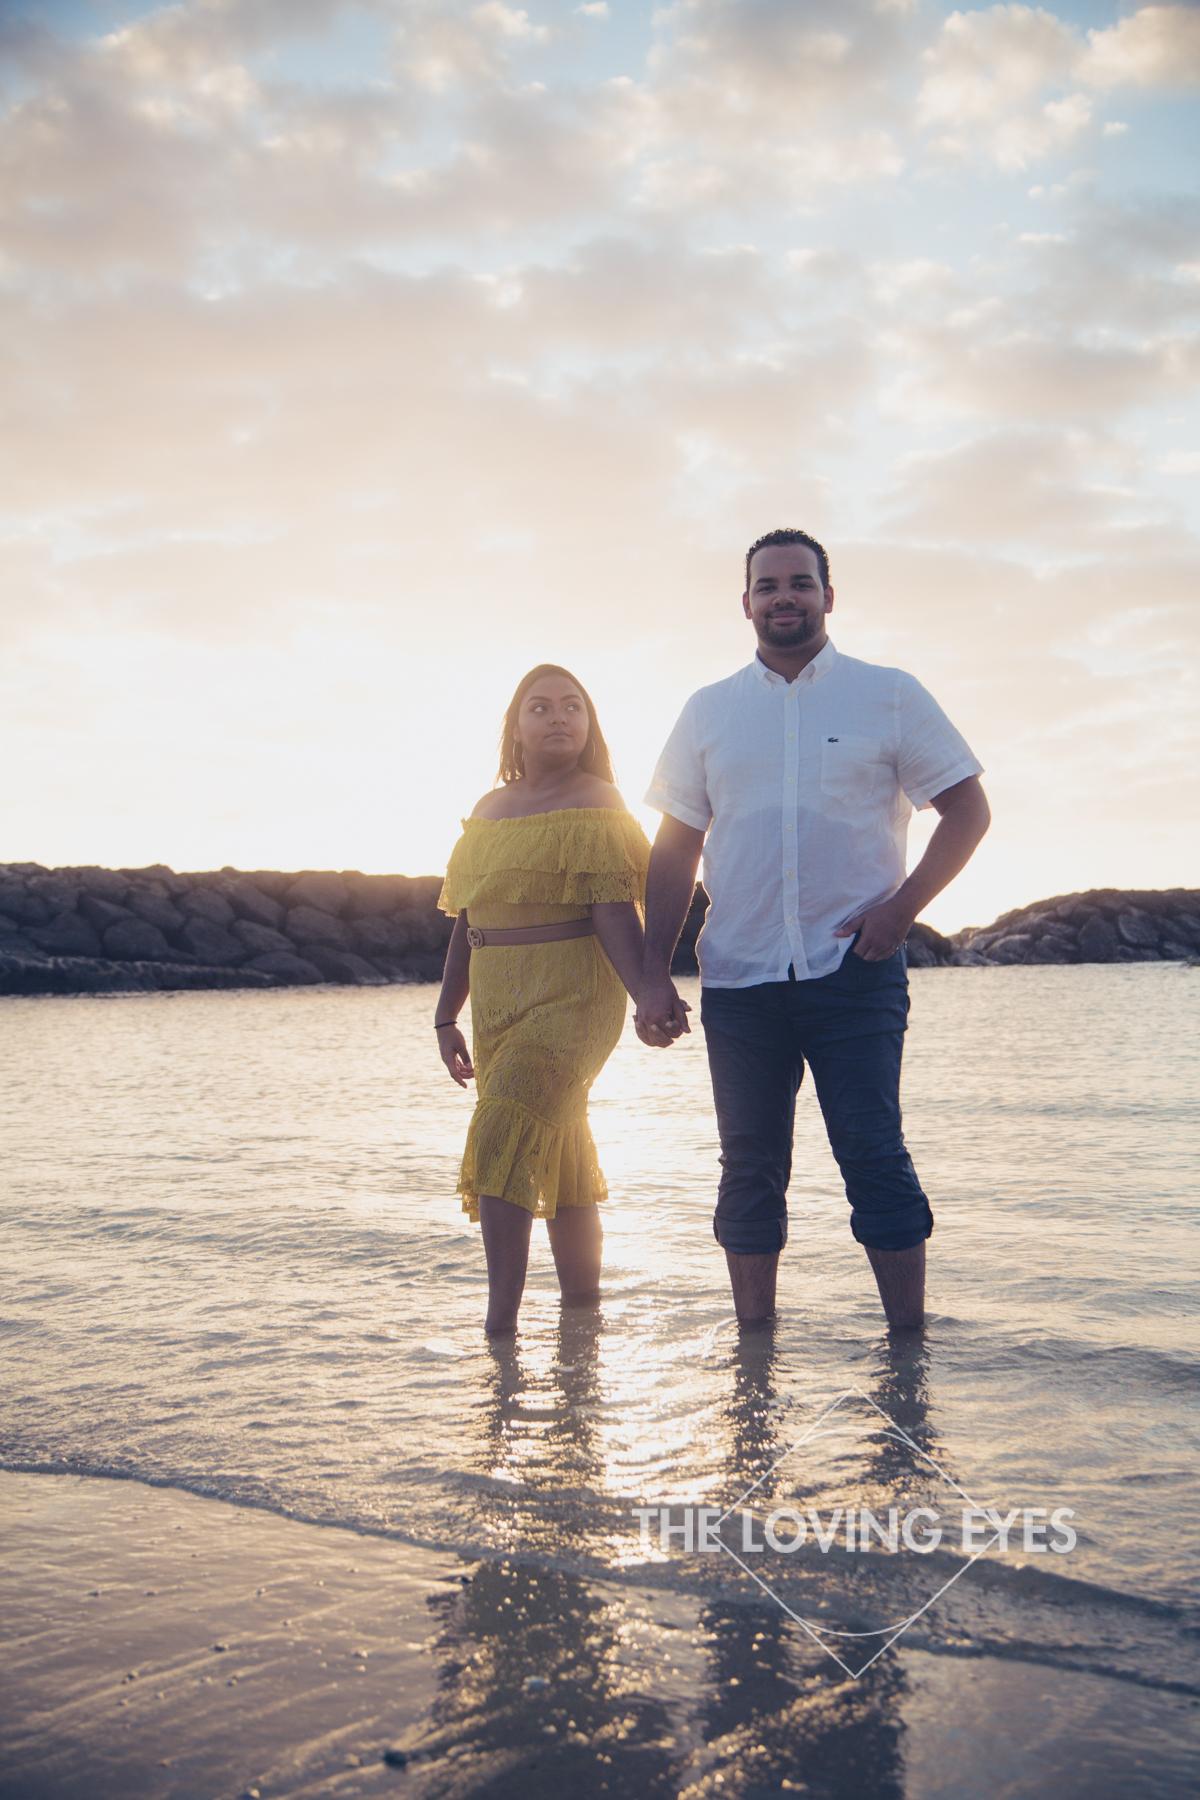 Romantic Hawaii engagement photo during sunset at Ala Moana Beach Park